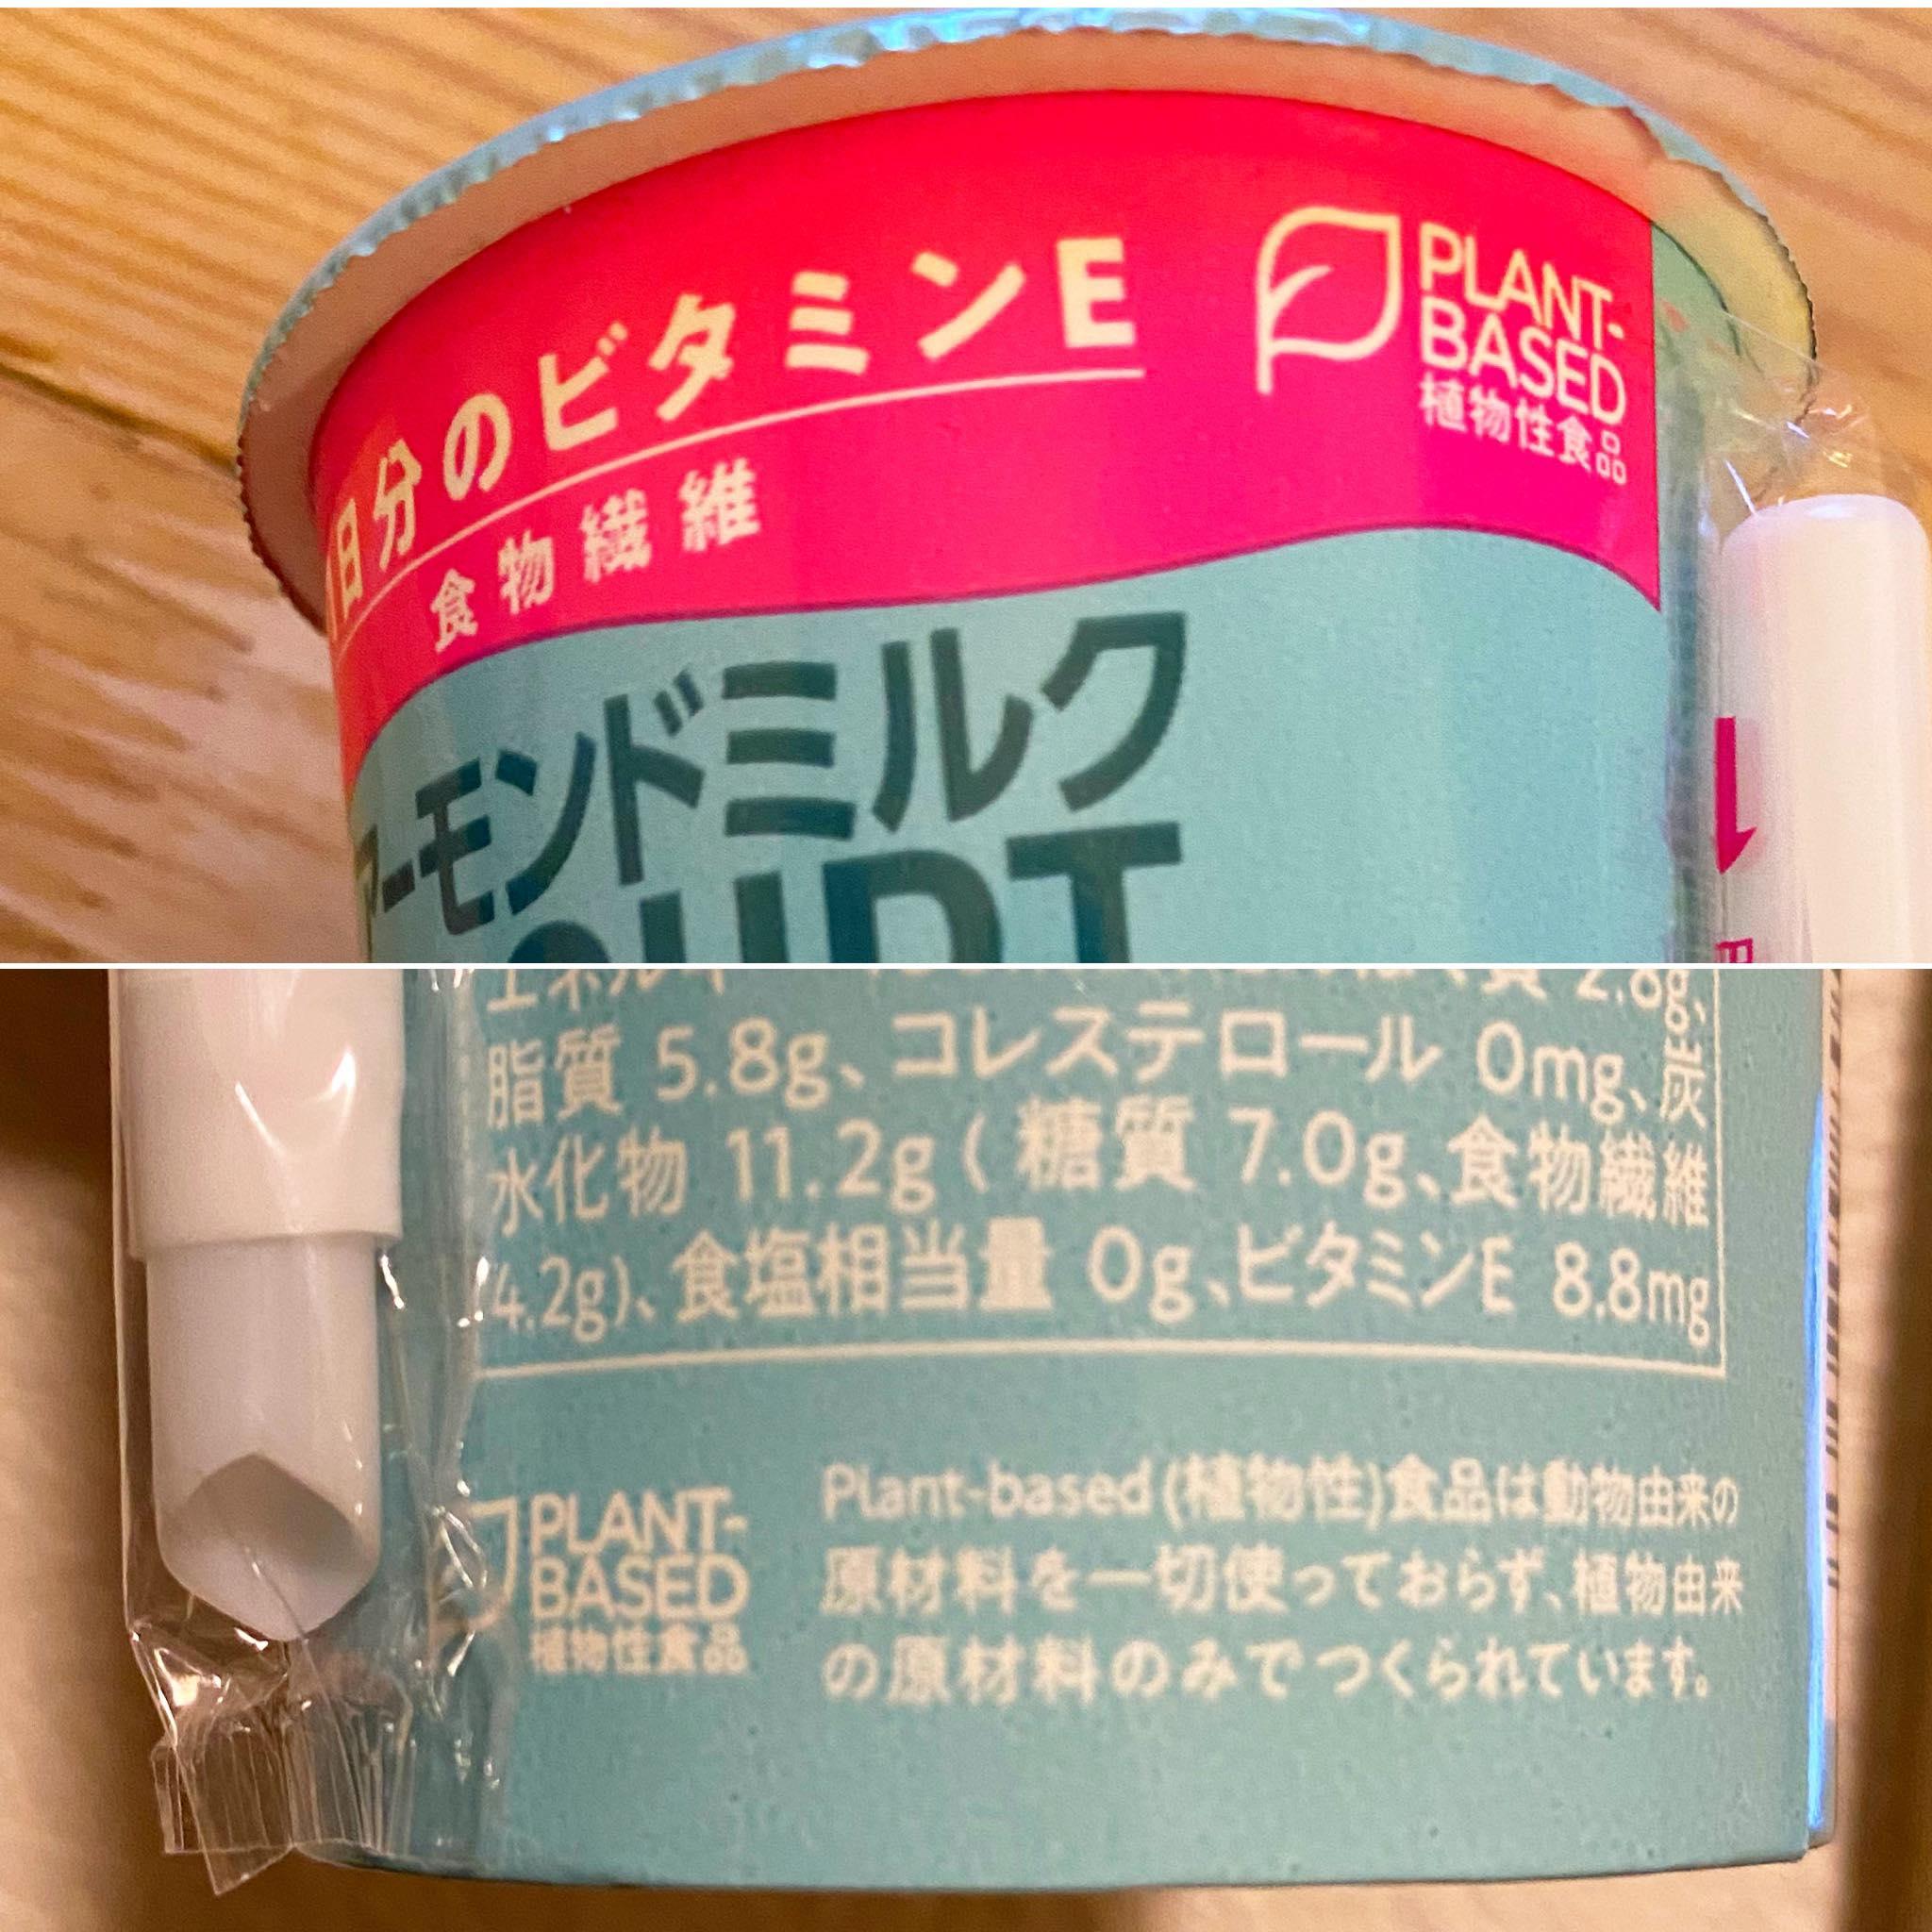 Horimilk Almond Milk Yogurt Drink Plant-Based